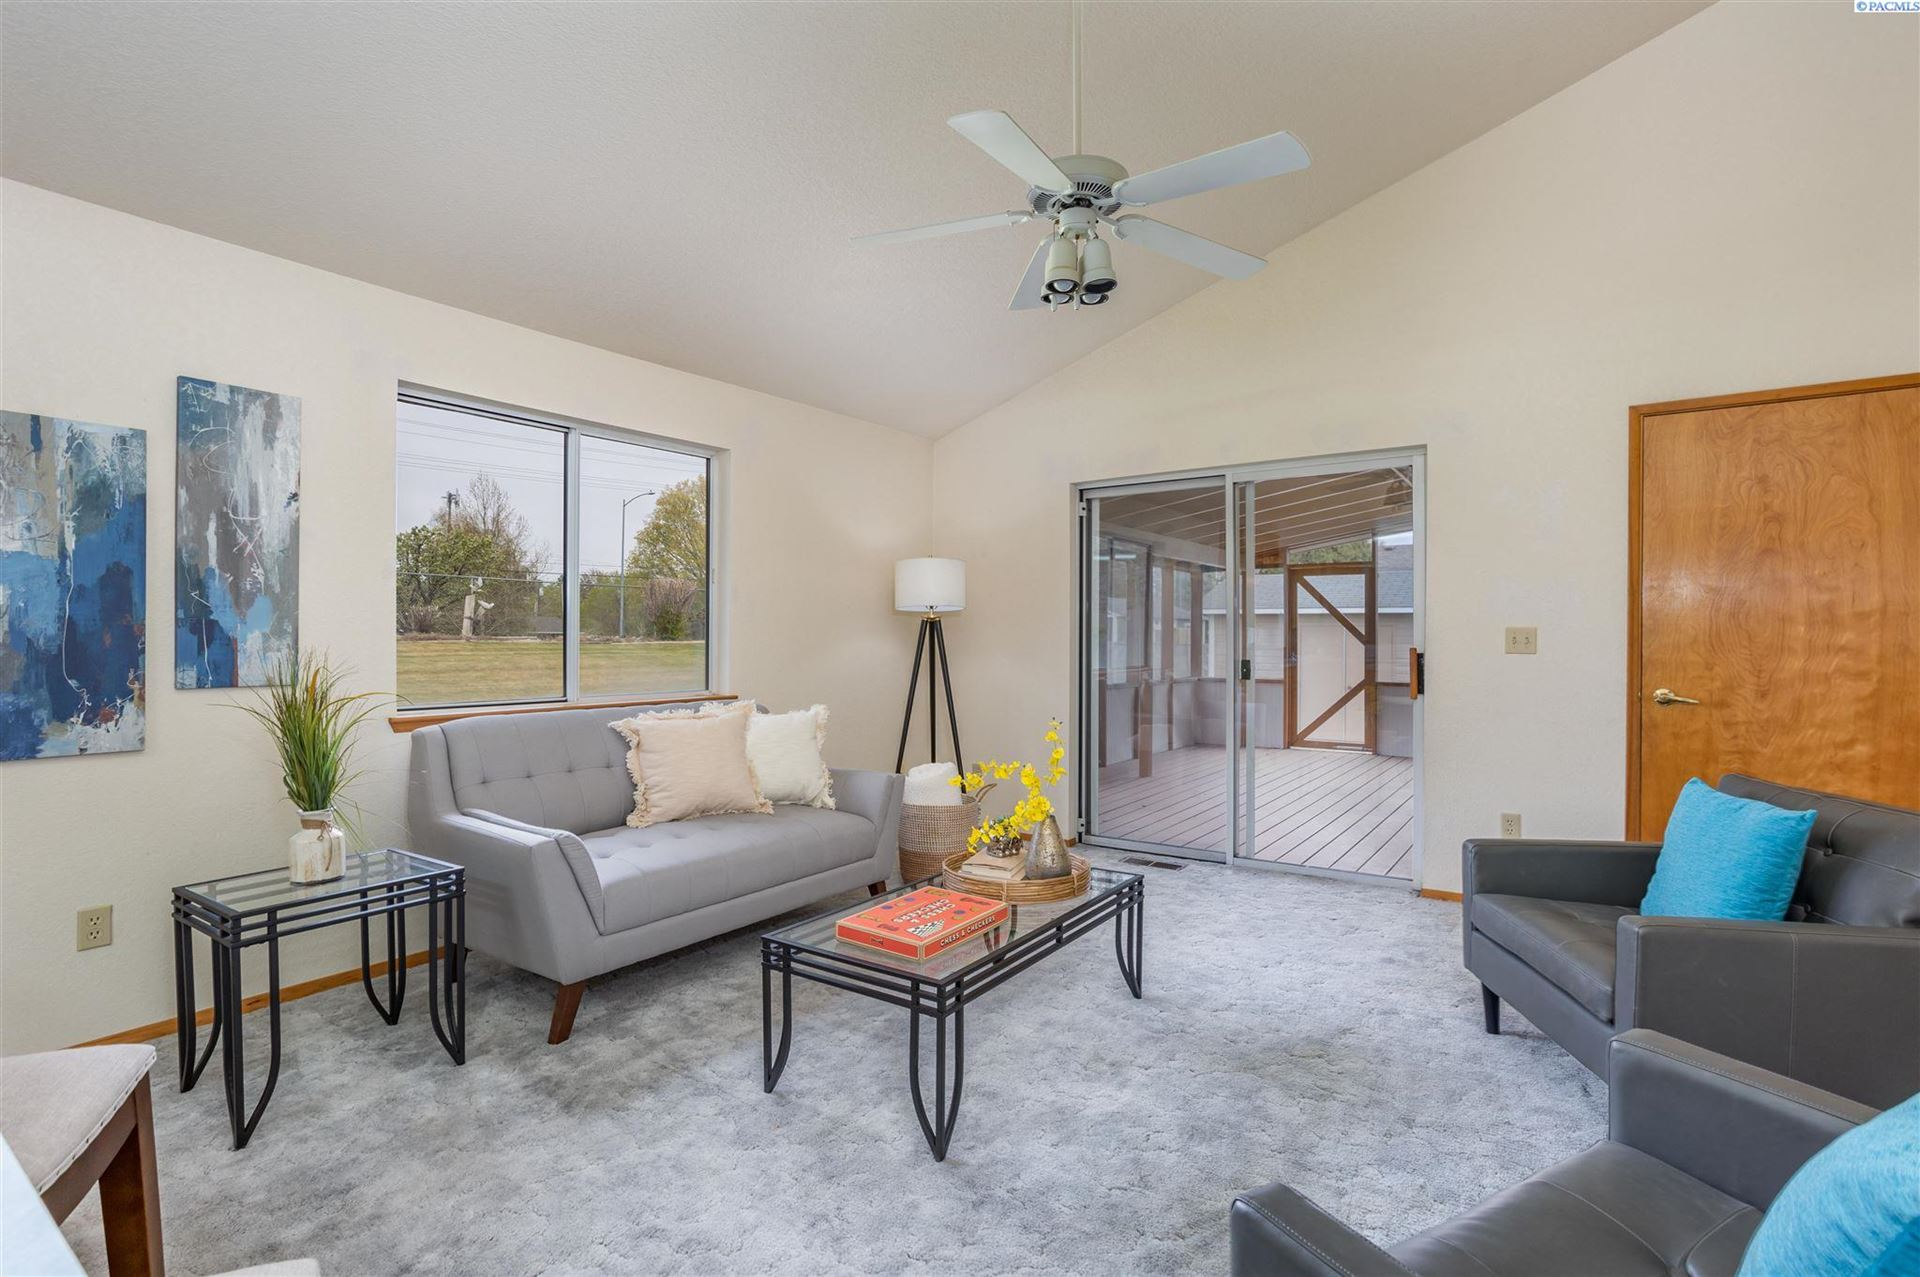 Photo of 6206 W 10th Place, Kennewick, WA 99338 (MLS # 252863)